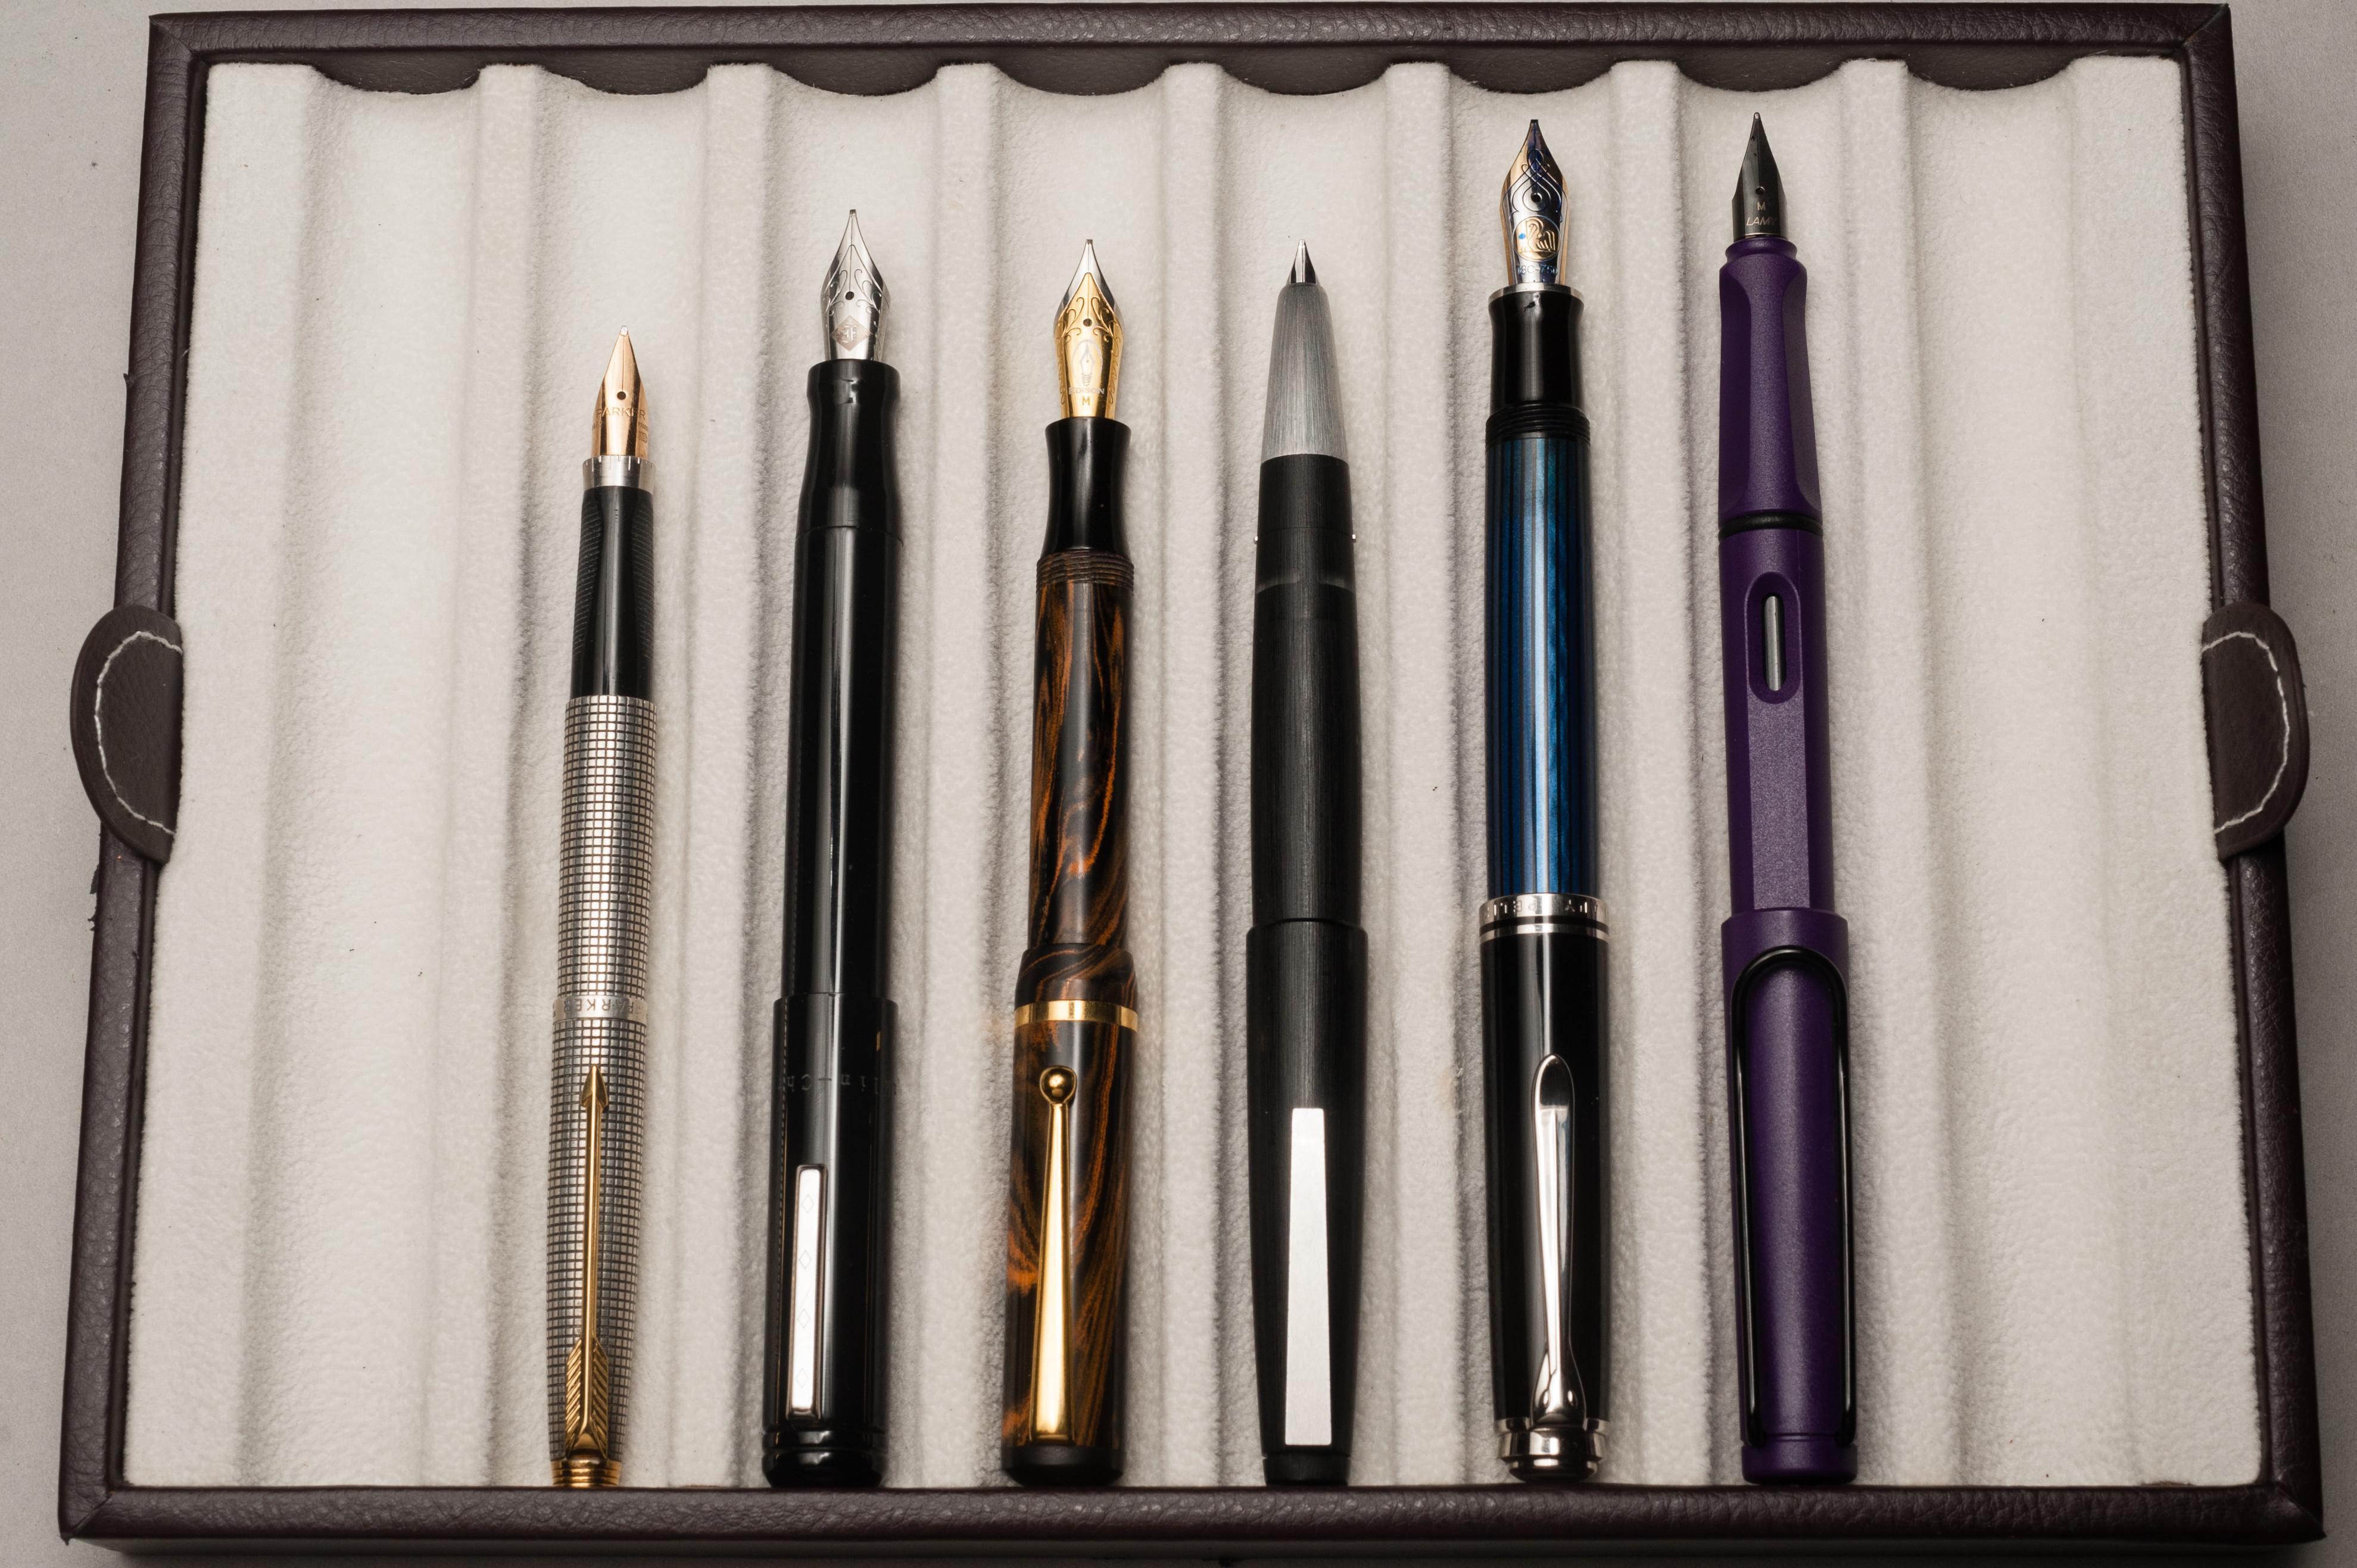 20160709_HOTP Pen Comp Lamy 2000_002